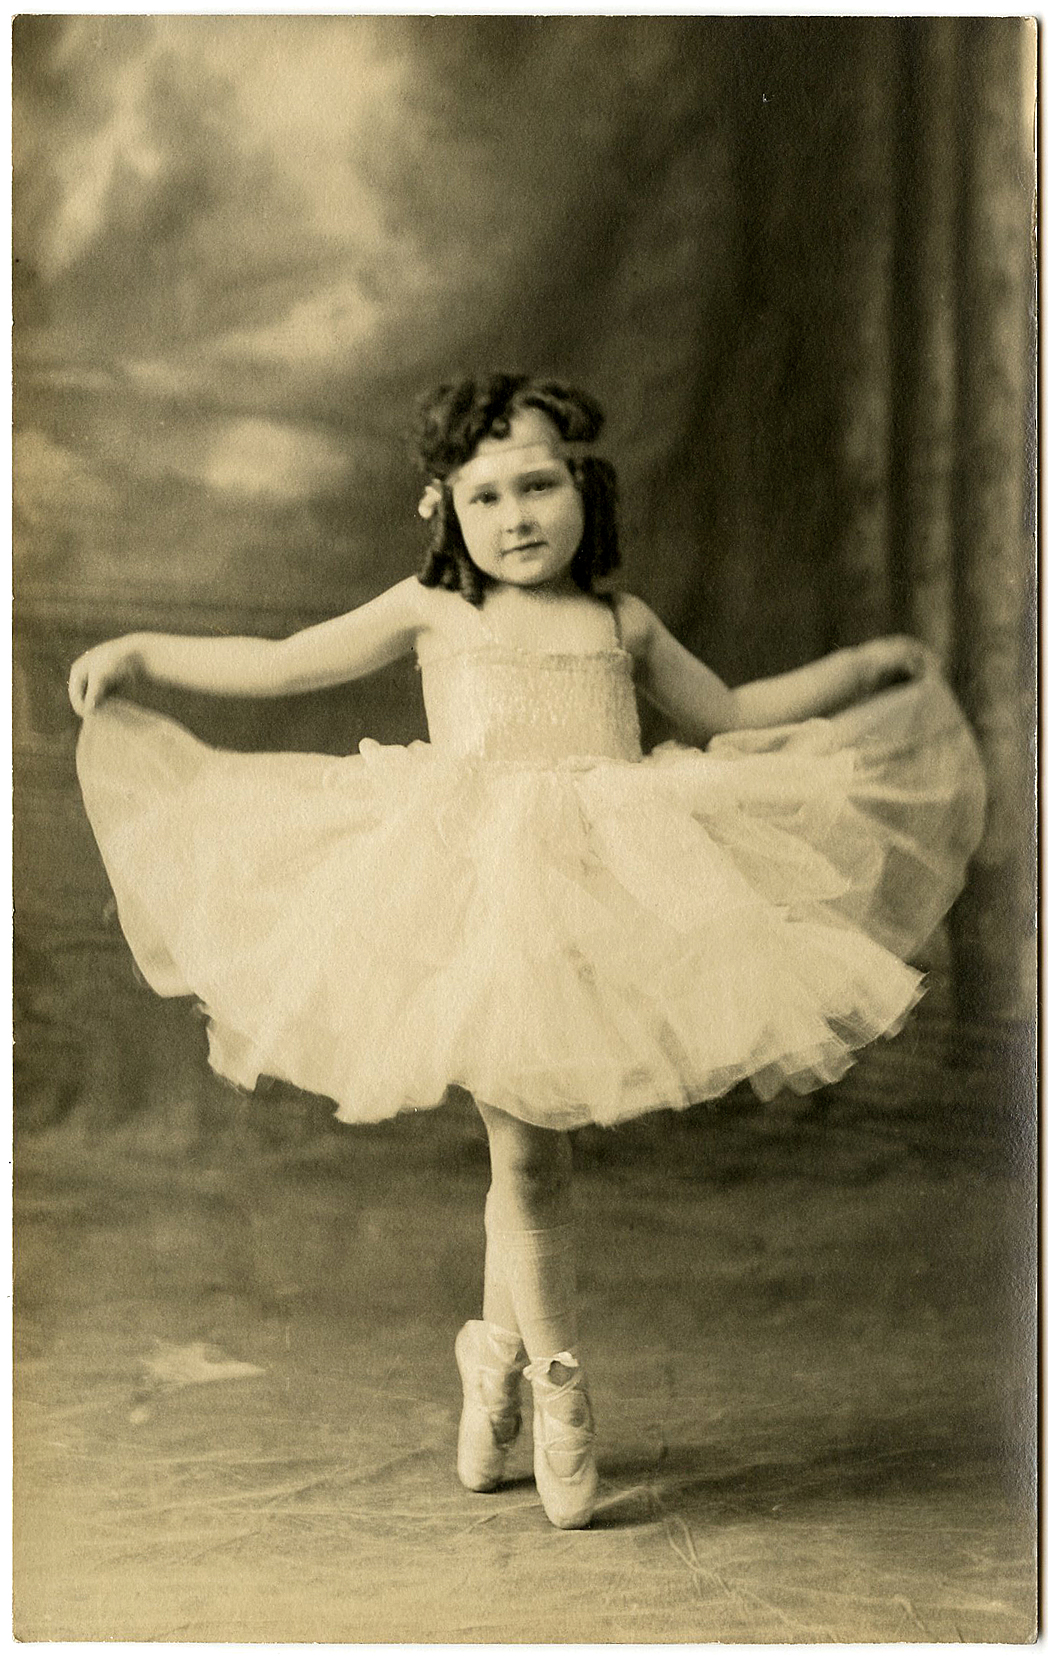 Old Photo Ballerina Girl - The Graphics Fairy